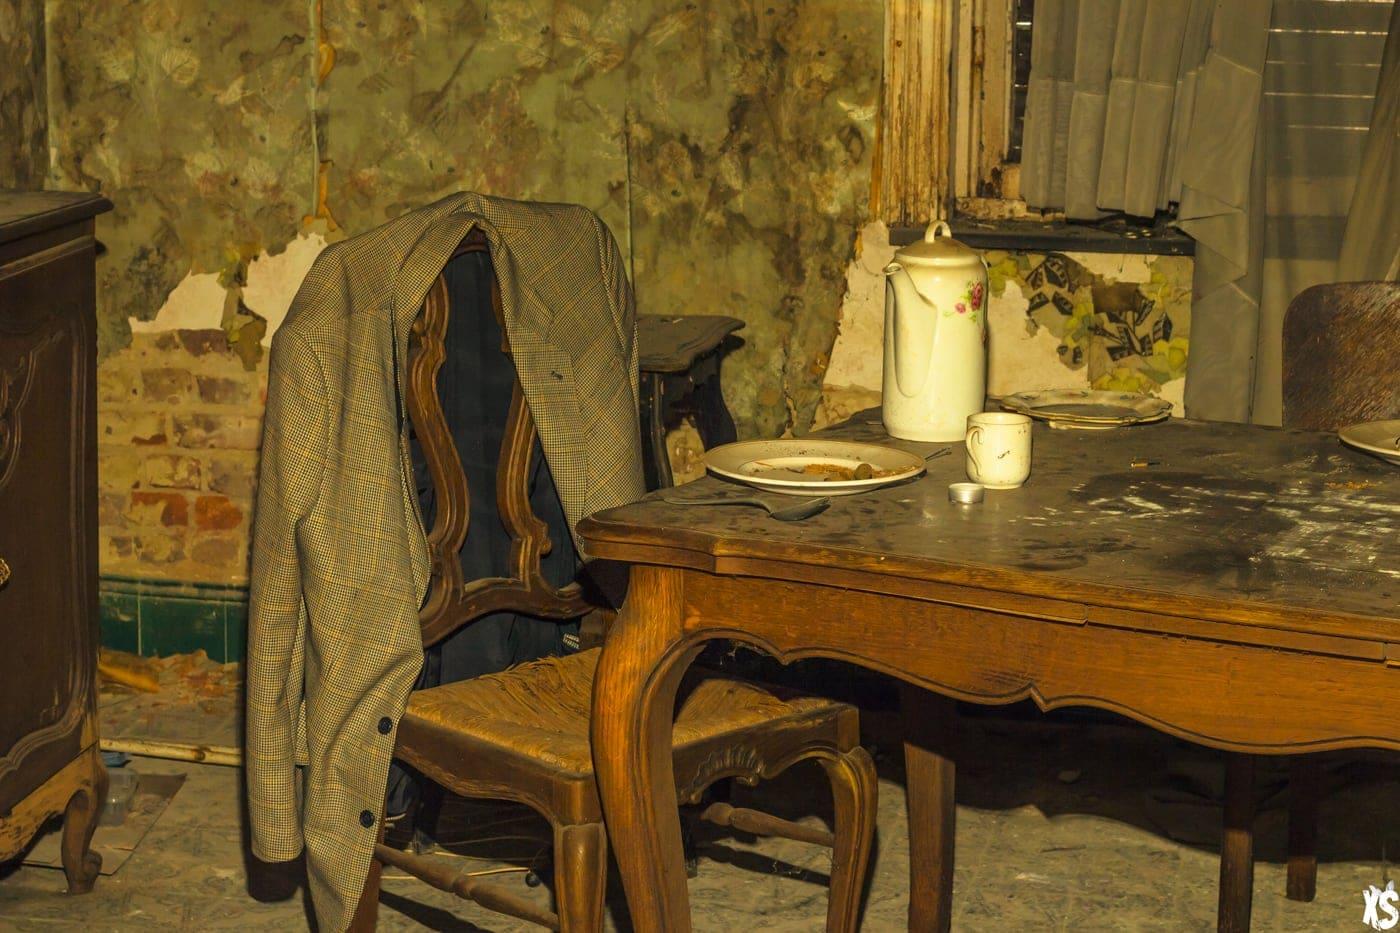 Abandoned House in Belgium : https://urbexsession.com/en/house-luka-magnotta